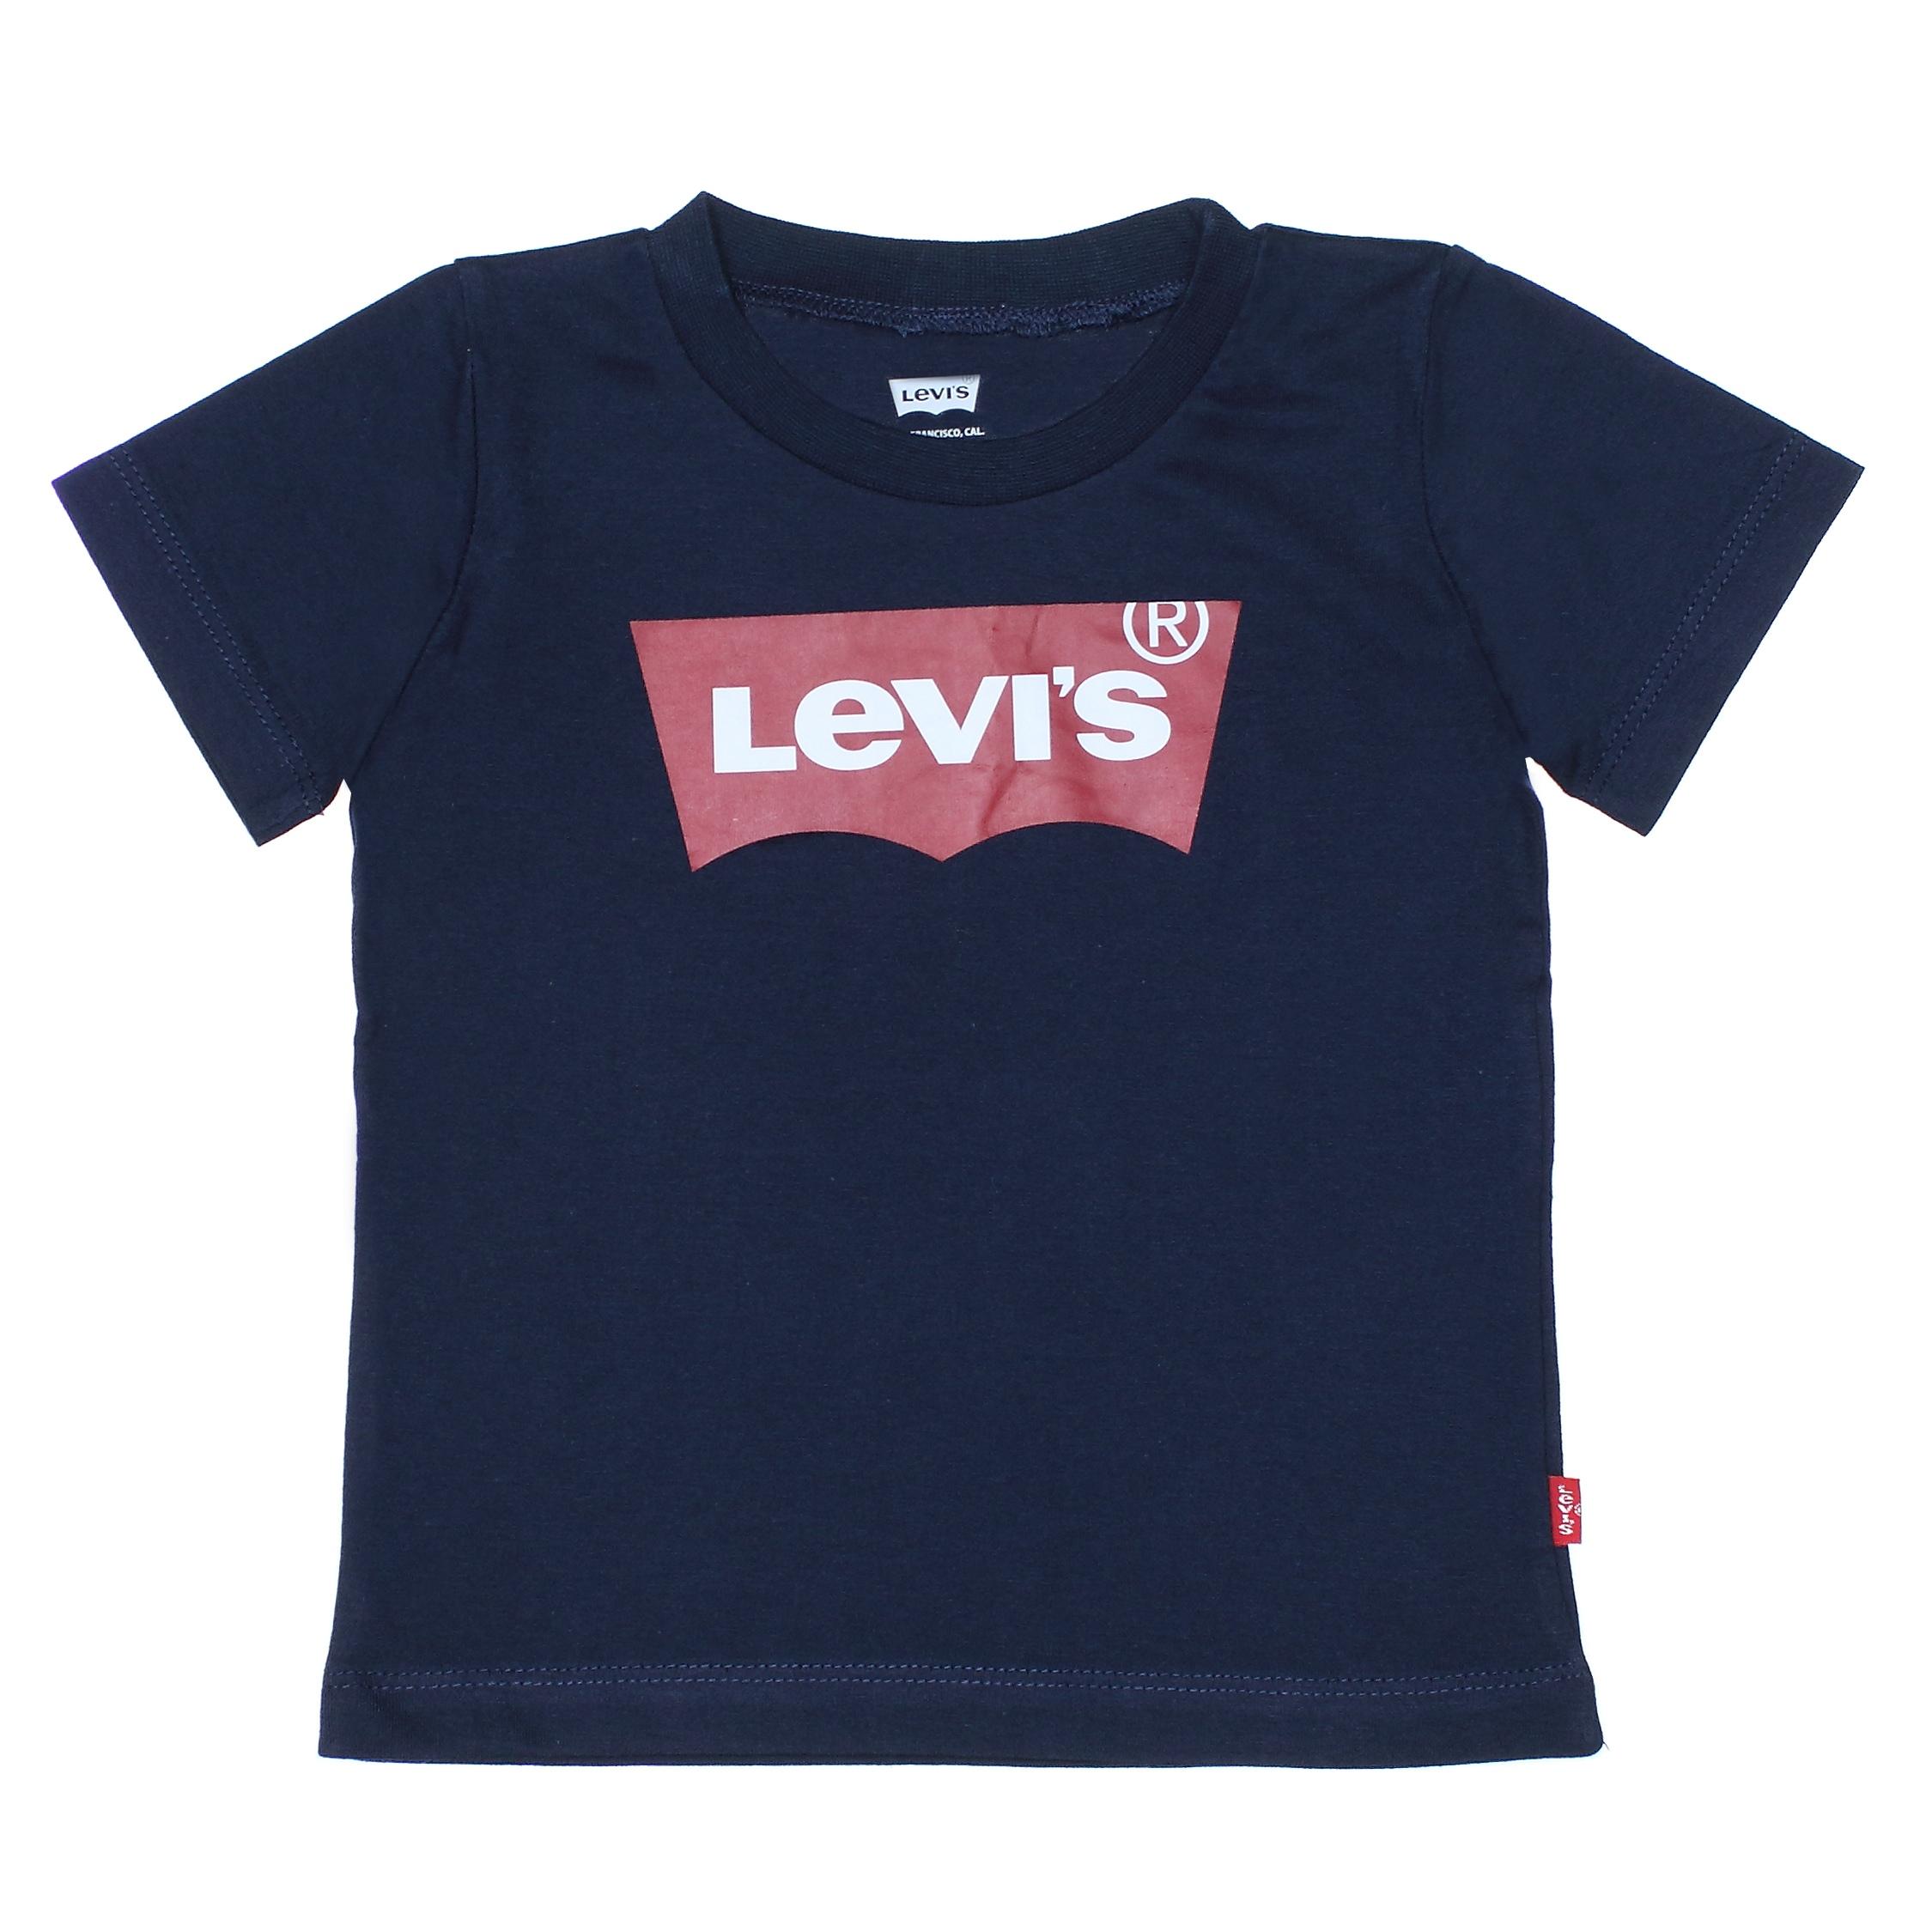 https://www.leadermode.com/183919/levi-s-kids-6e8157-u09-dress-blue.jpg